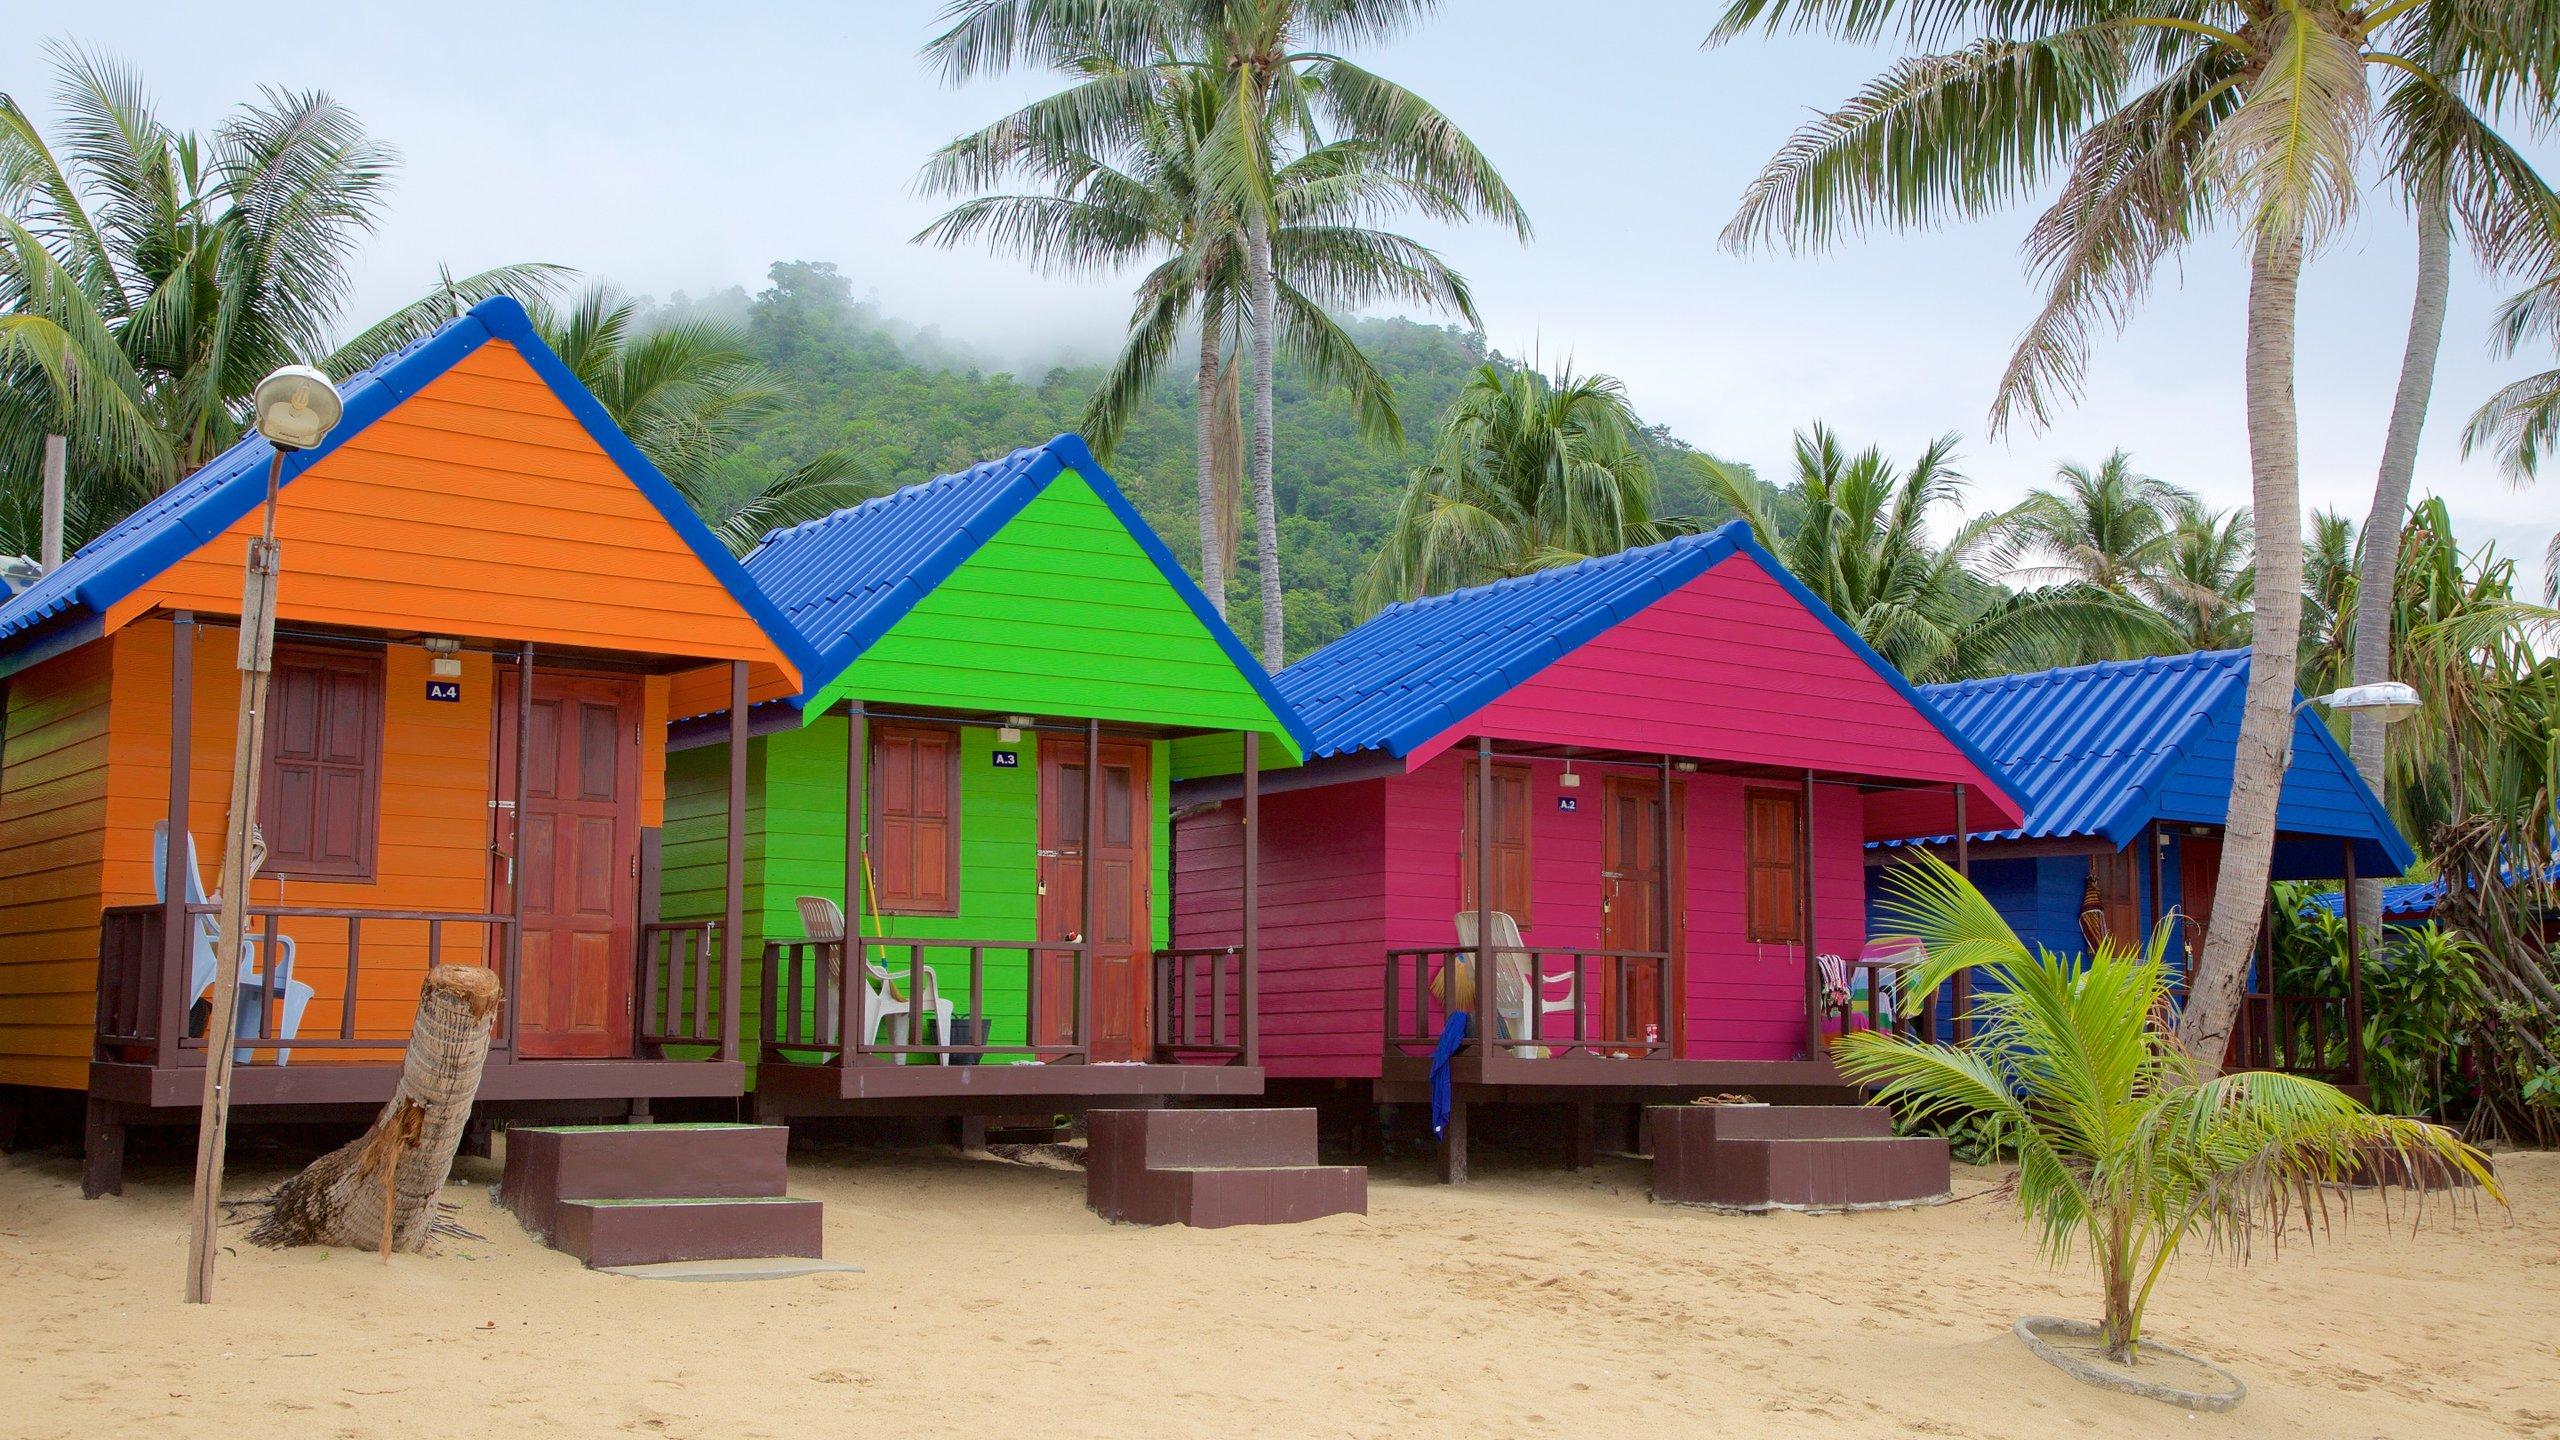 Strand von Lamai, Ko Samui, Surat Thani (Provinz), Thailand